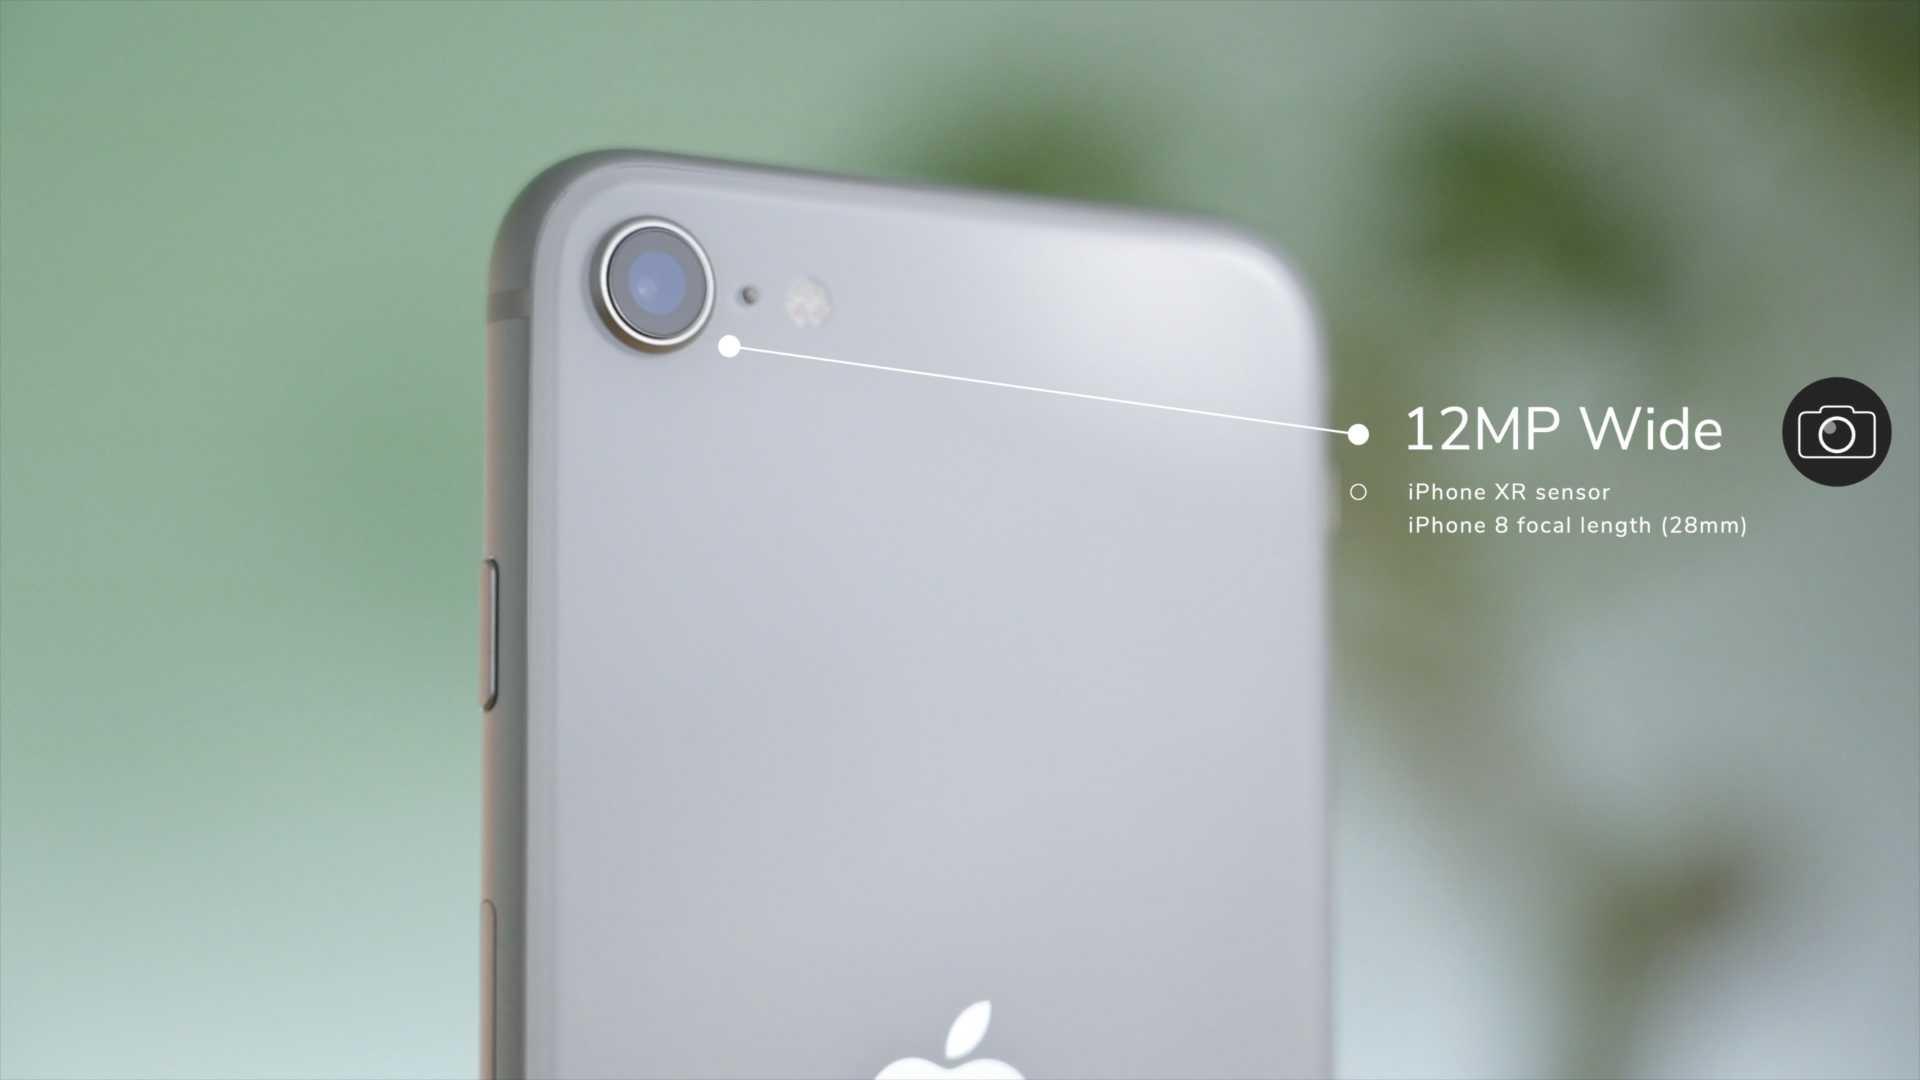 iPhone SE uses the same camera sensor as the iPhone XR with the same focal length as the iPhone 8